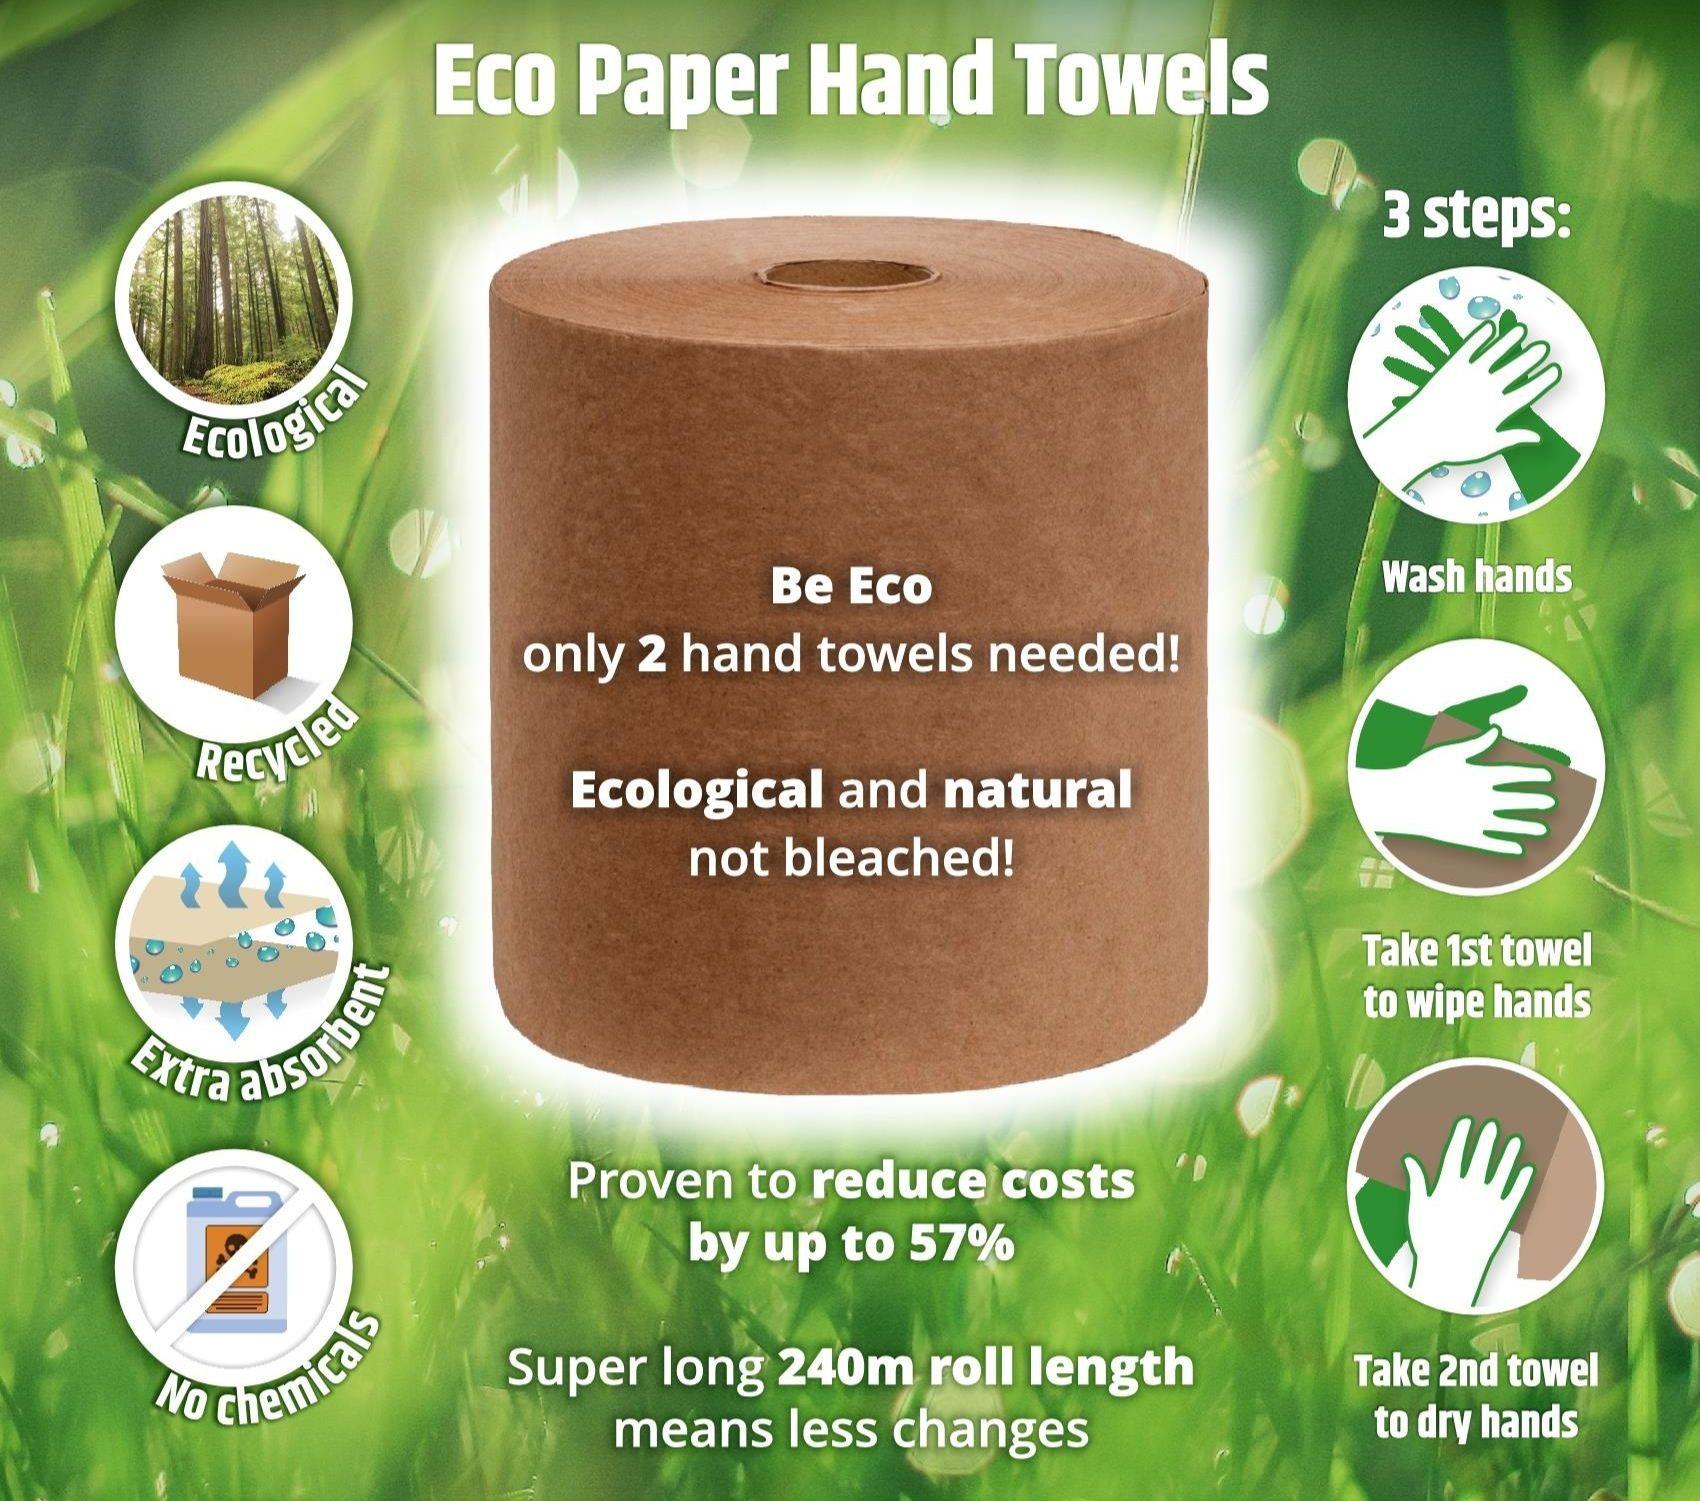 Hanzl-Hand-Towel-System eco friendly